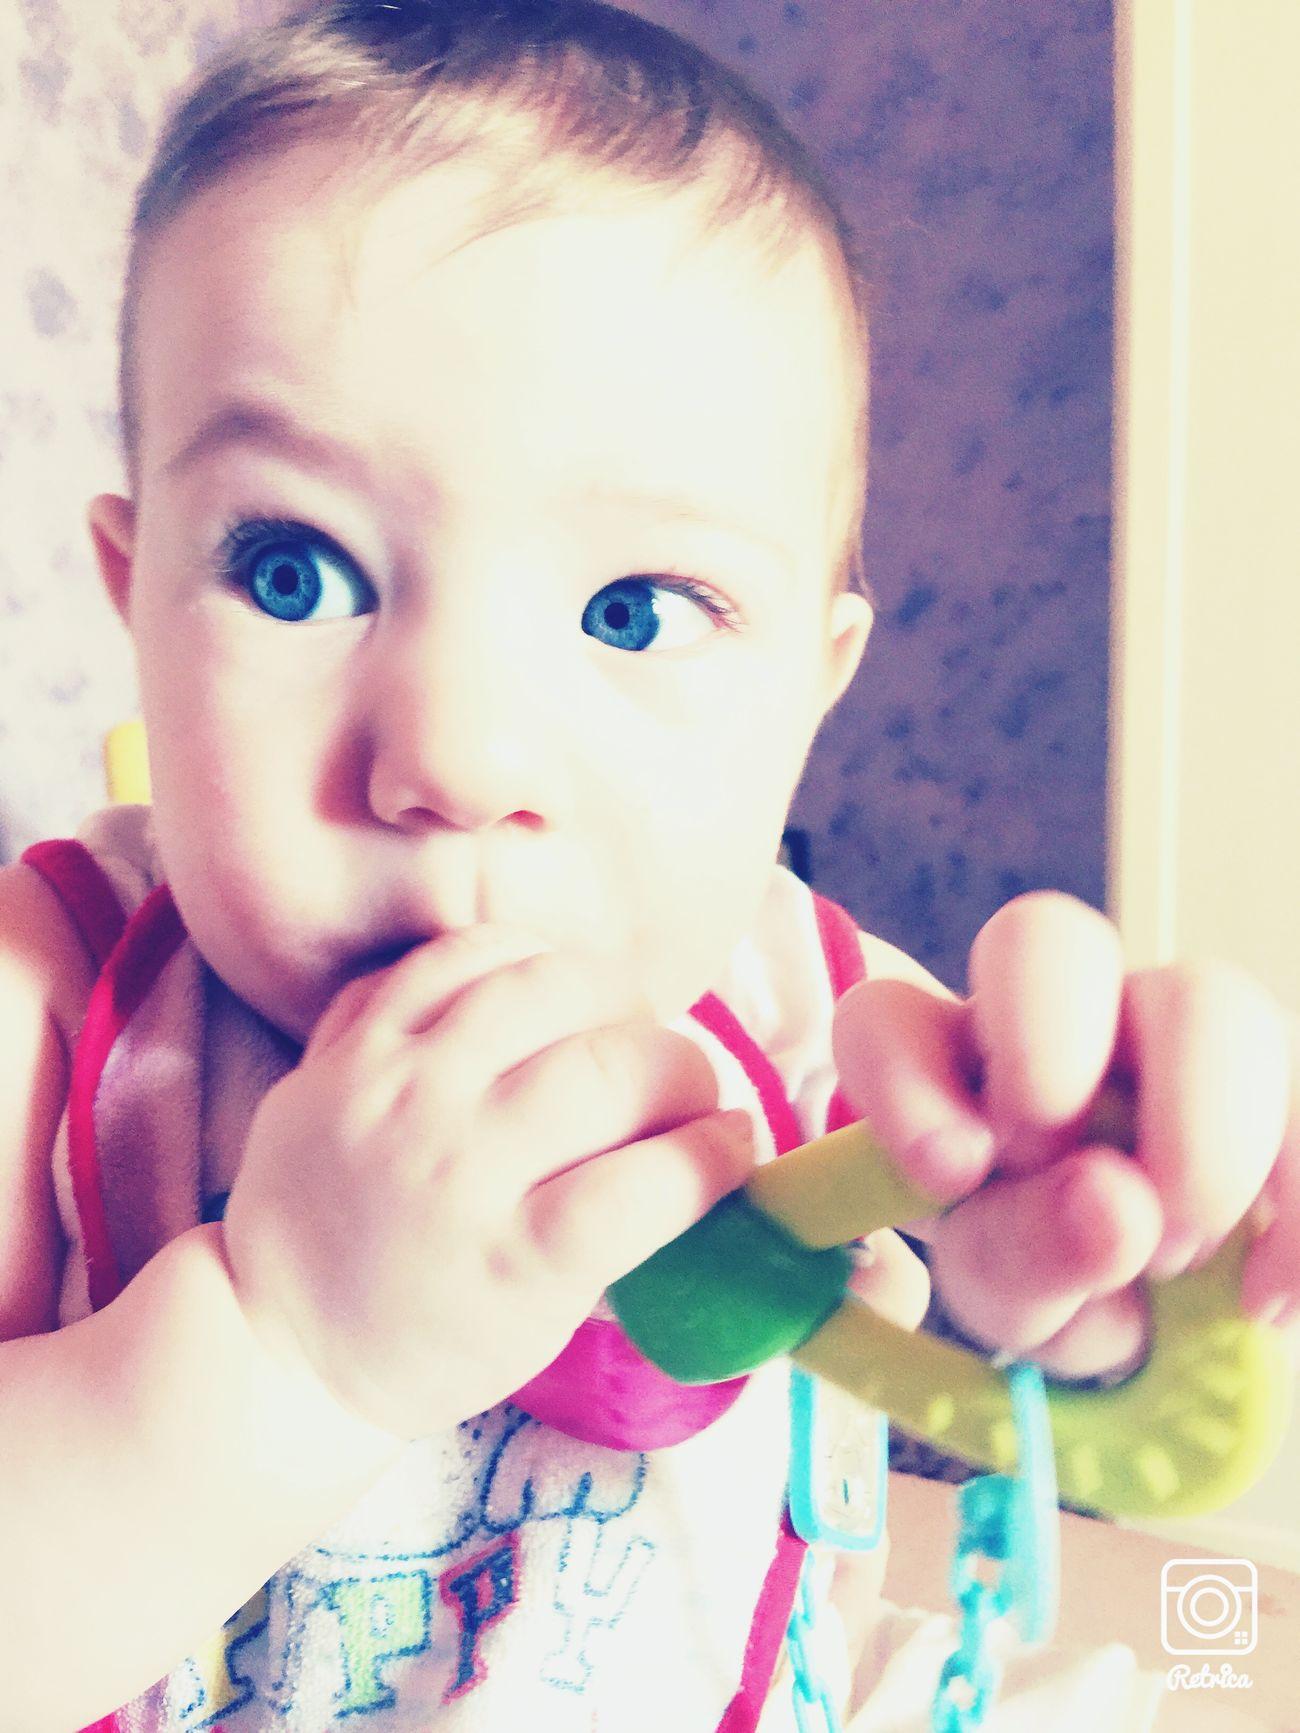 Littlebaby Occhiblu Infinita Innocenza❤️